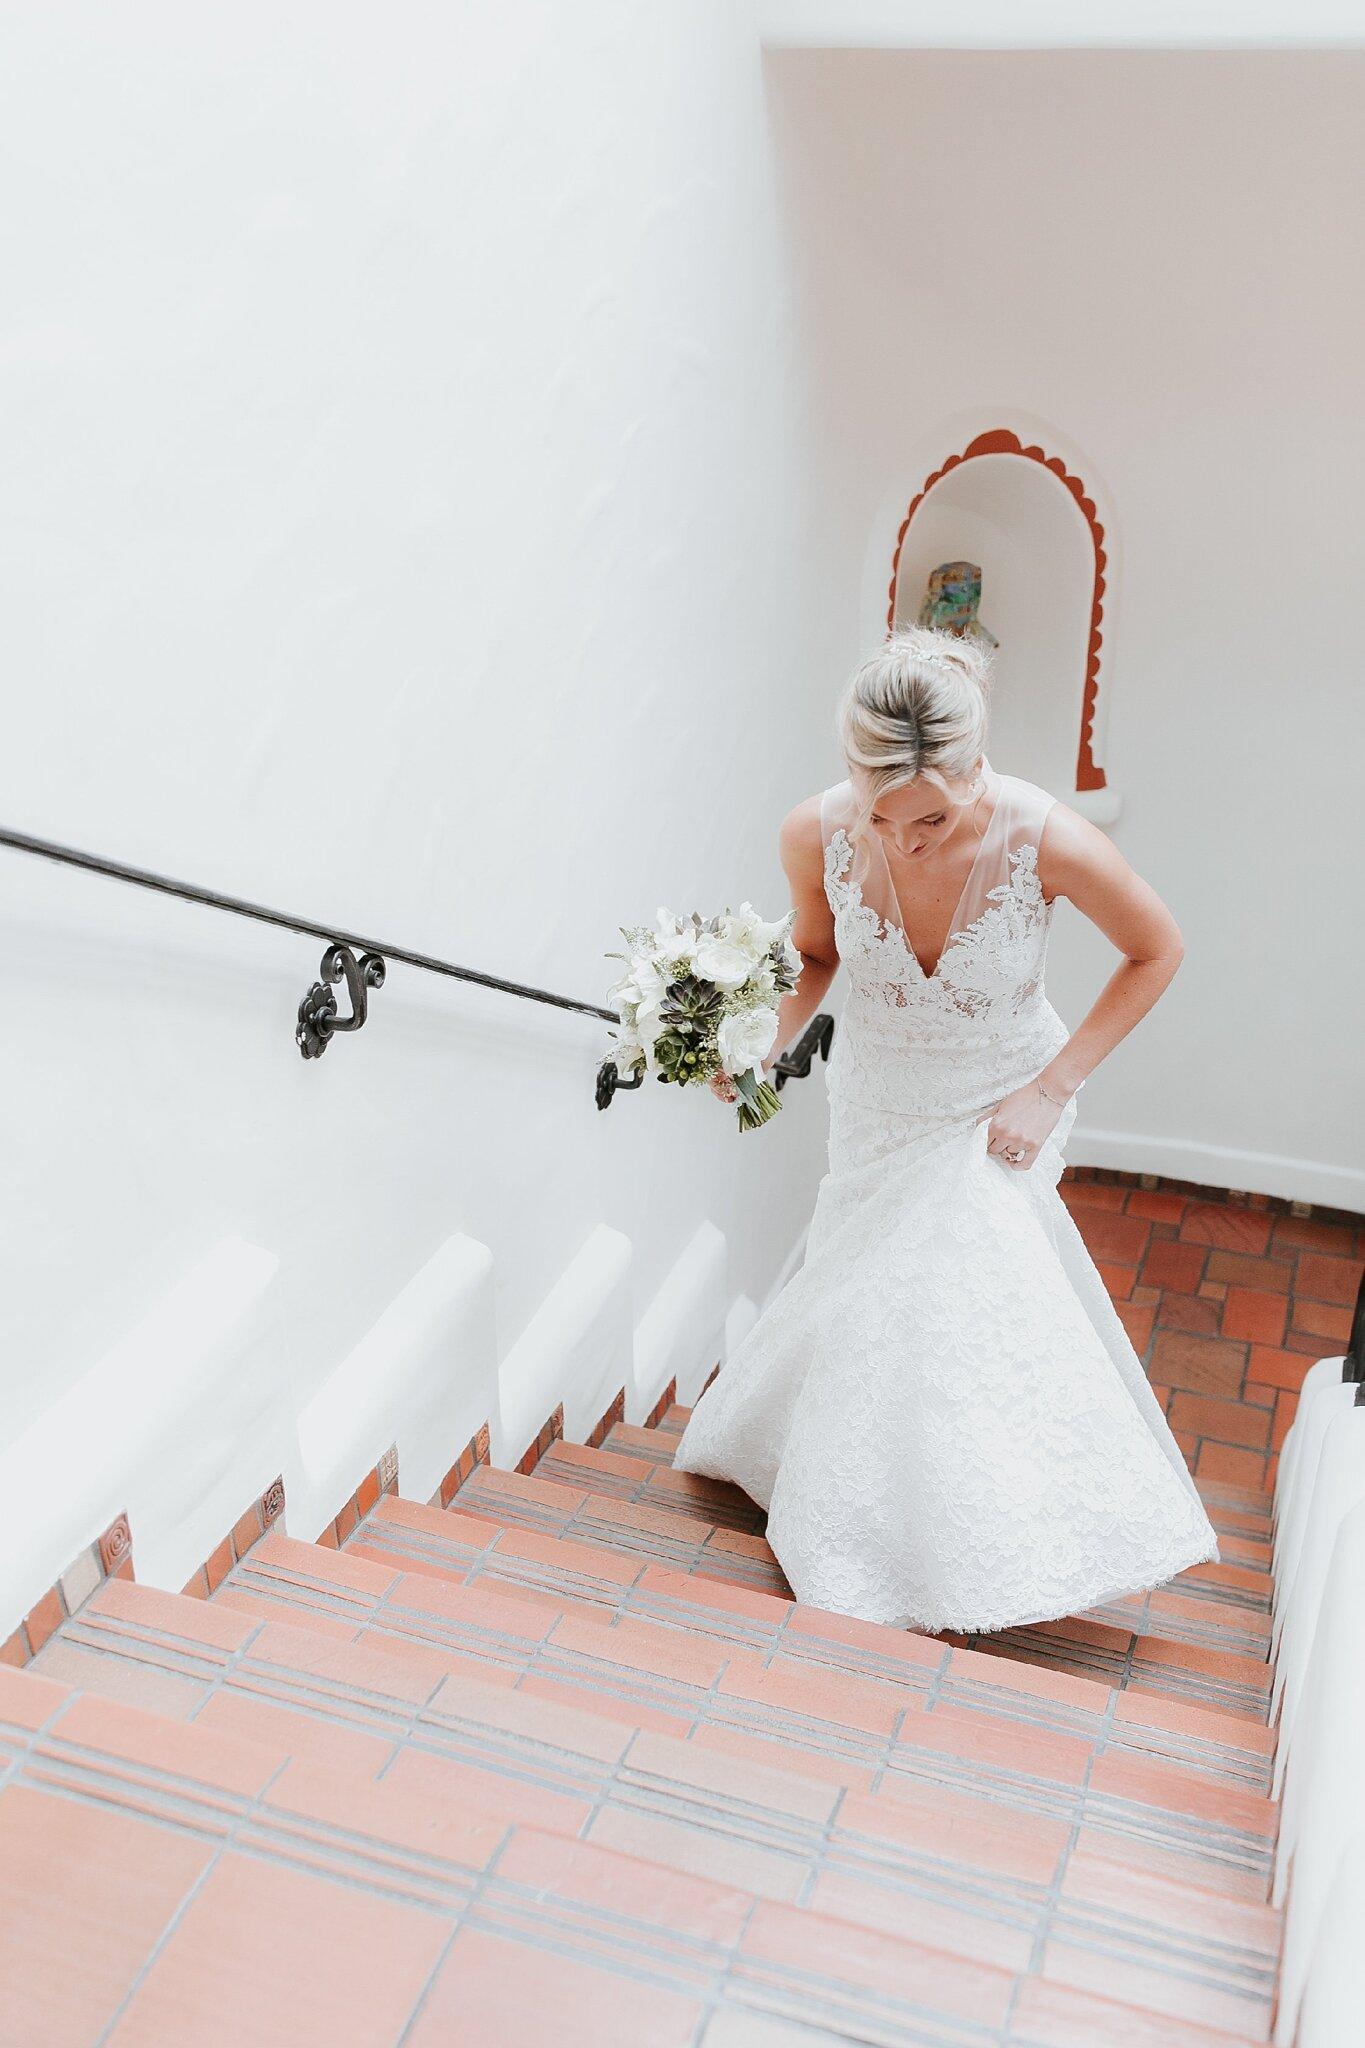 Alicia+lucia+photography+-+albuquerque+wedding+photographer+-+santa+fe+wedding+photography+-+new+mexico+wedding+photographer+-+new+mexico+wedding+-+wedding+makeup+-+wedidng+hair+-+wedding+makeup+artist+-+wedding+hair+stylist+-+drs+color+studio_0021.jpg